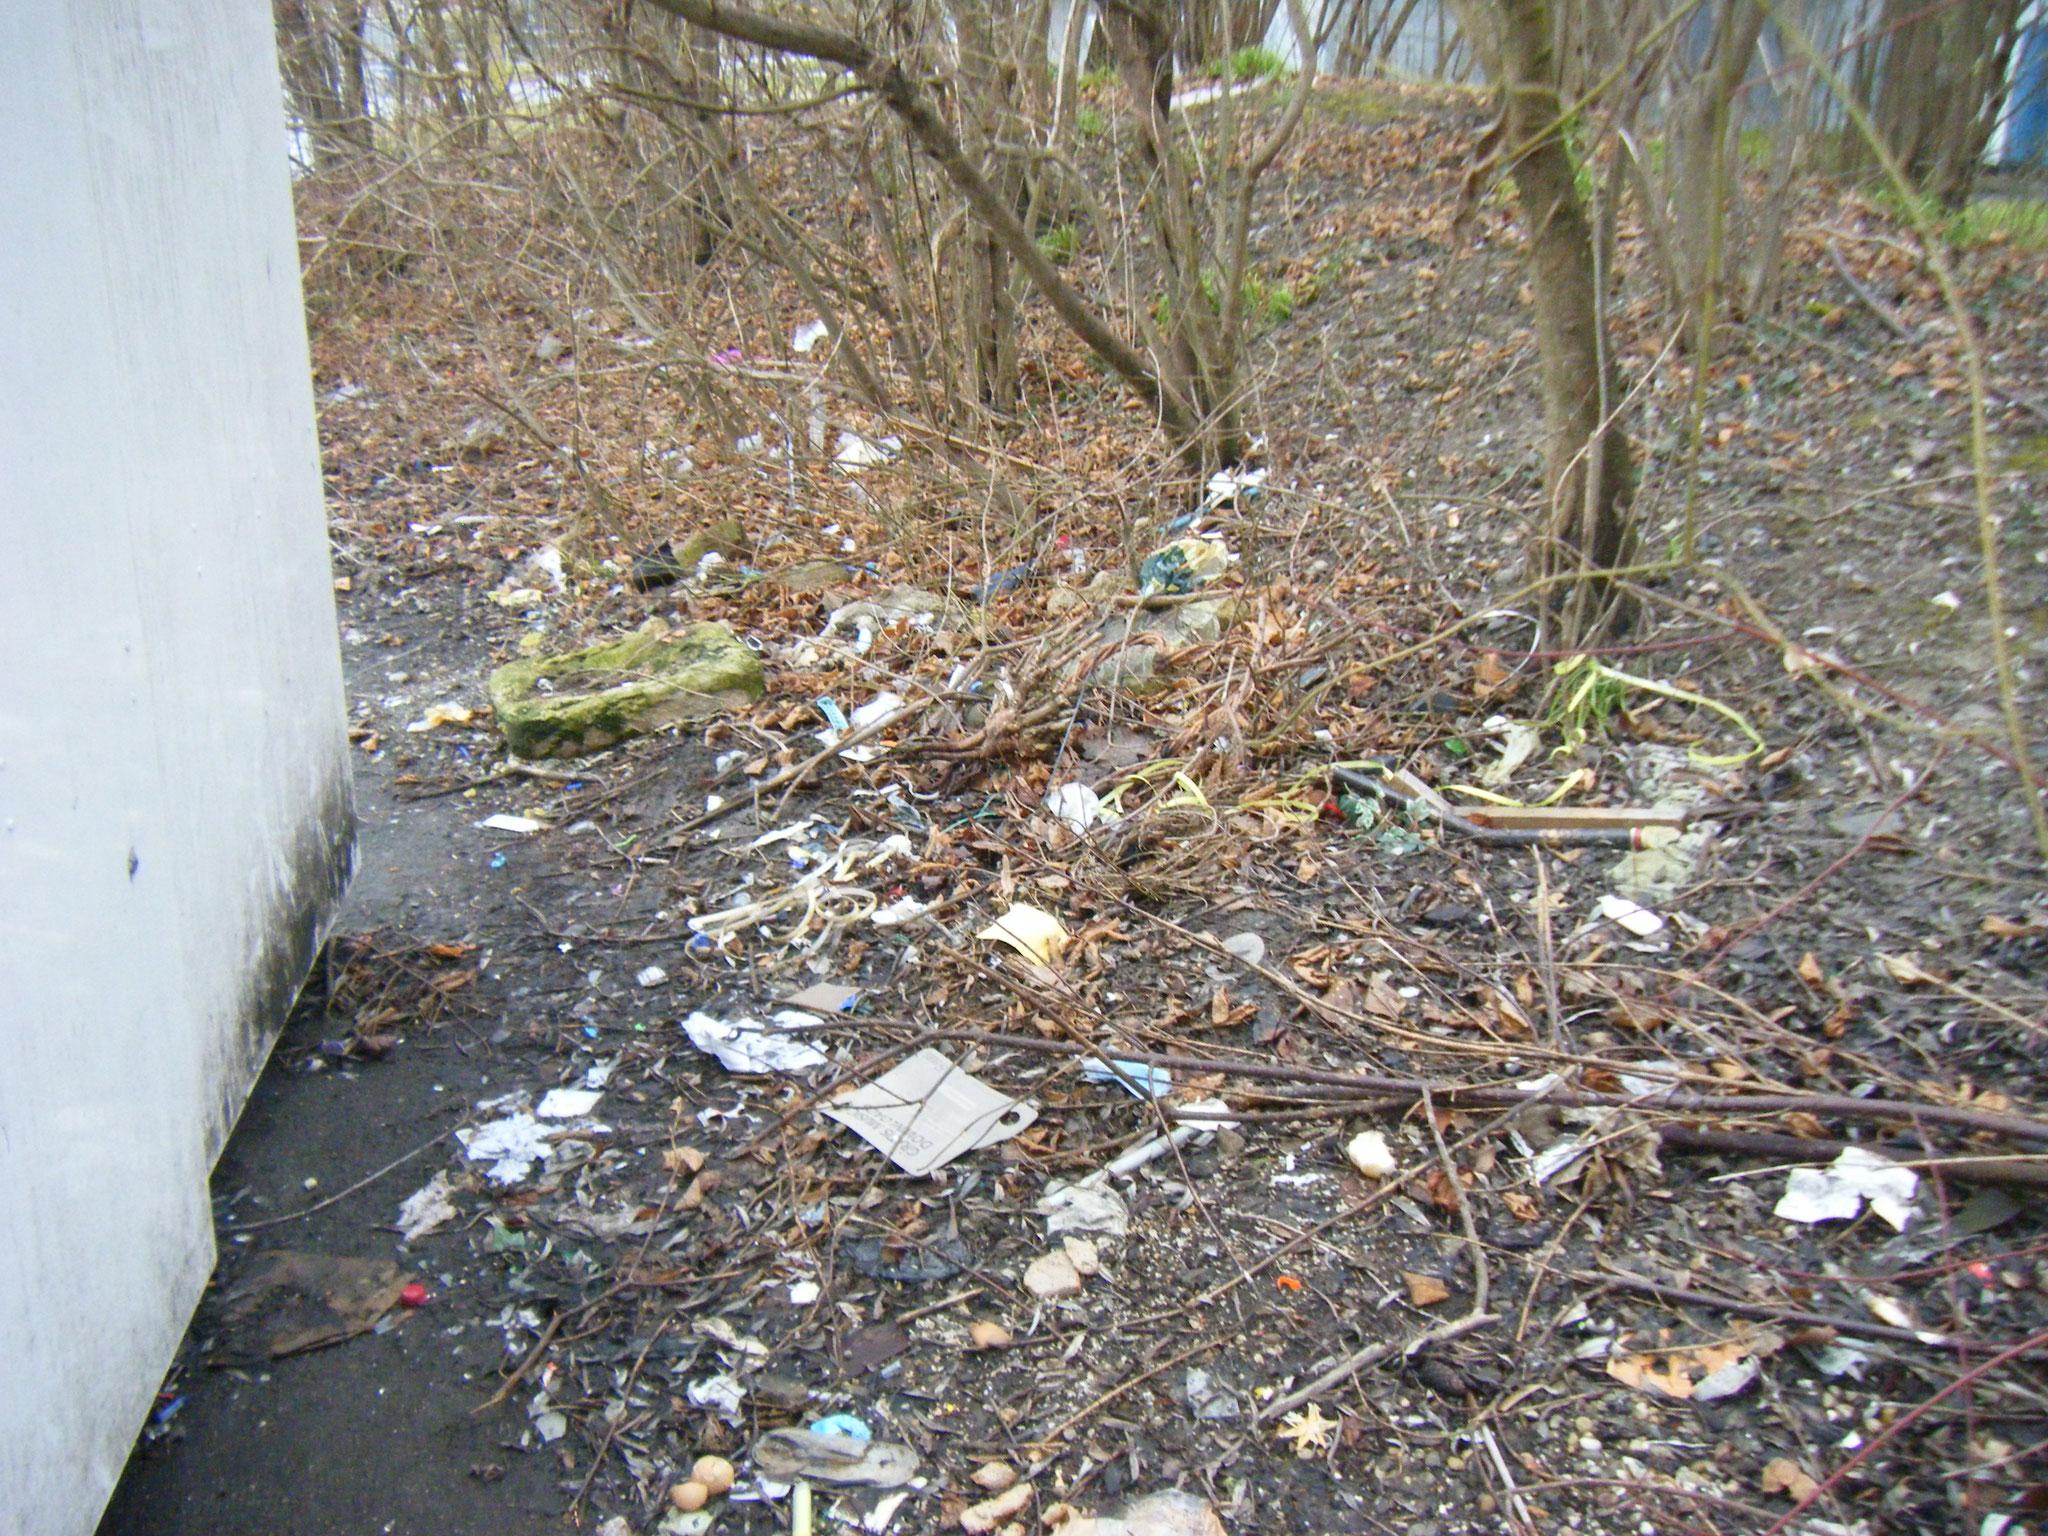 mehr Müll als Laub